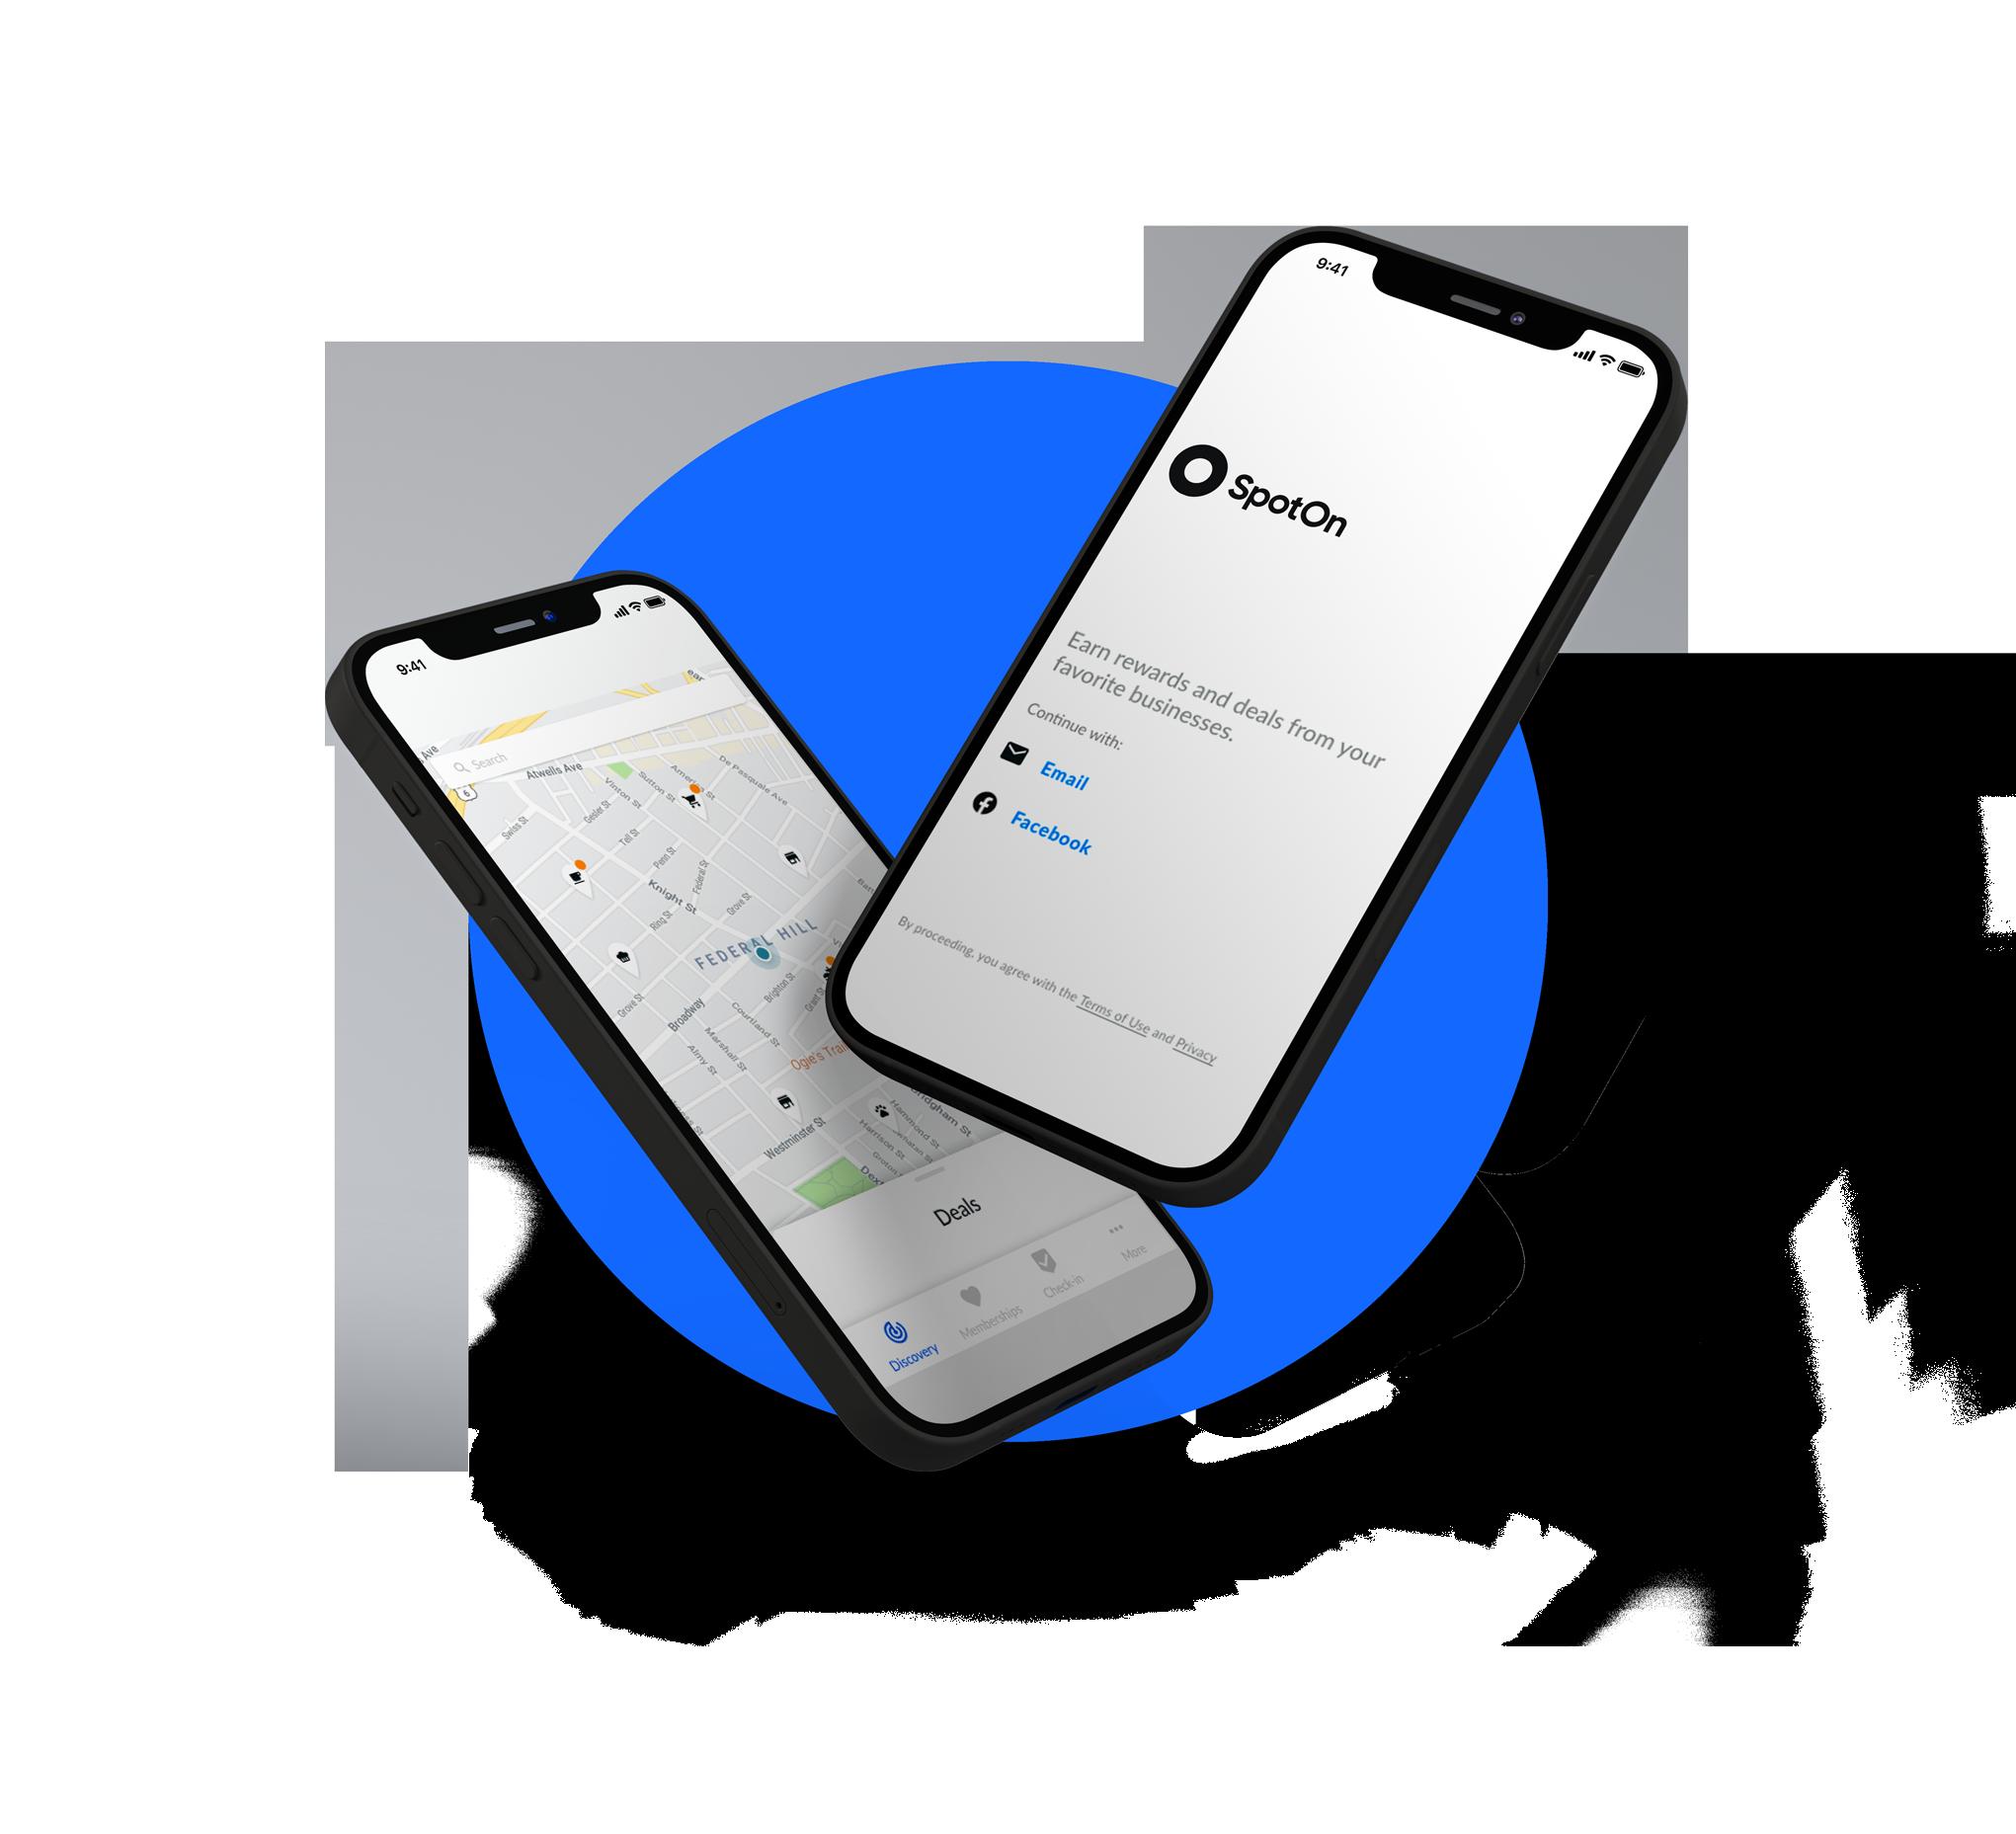 SpotOn App On Mobile